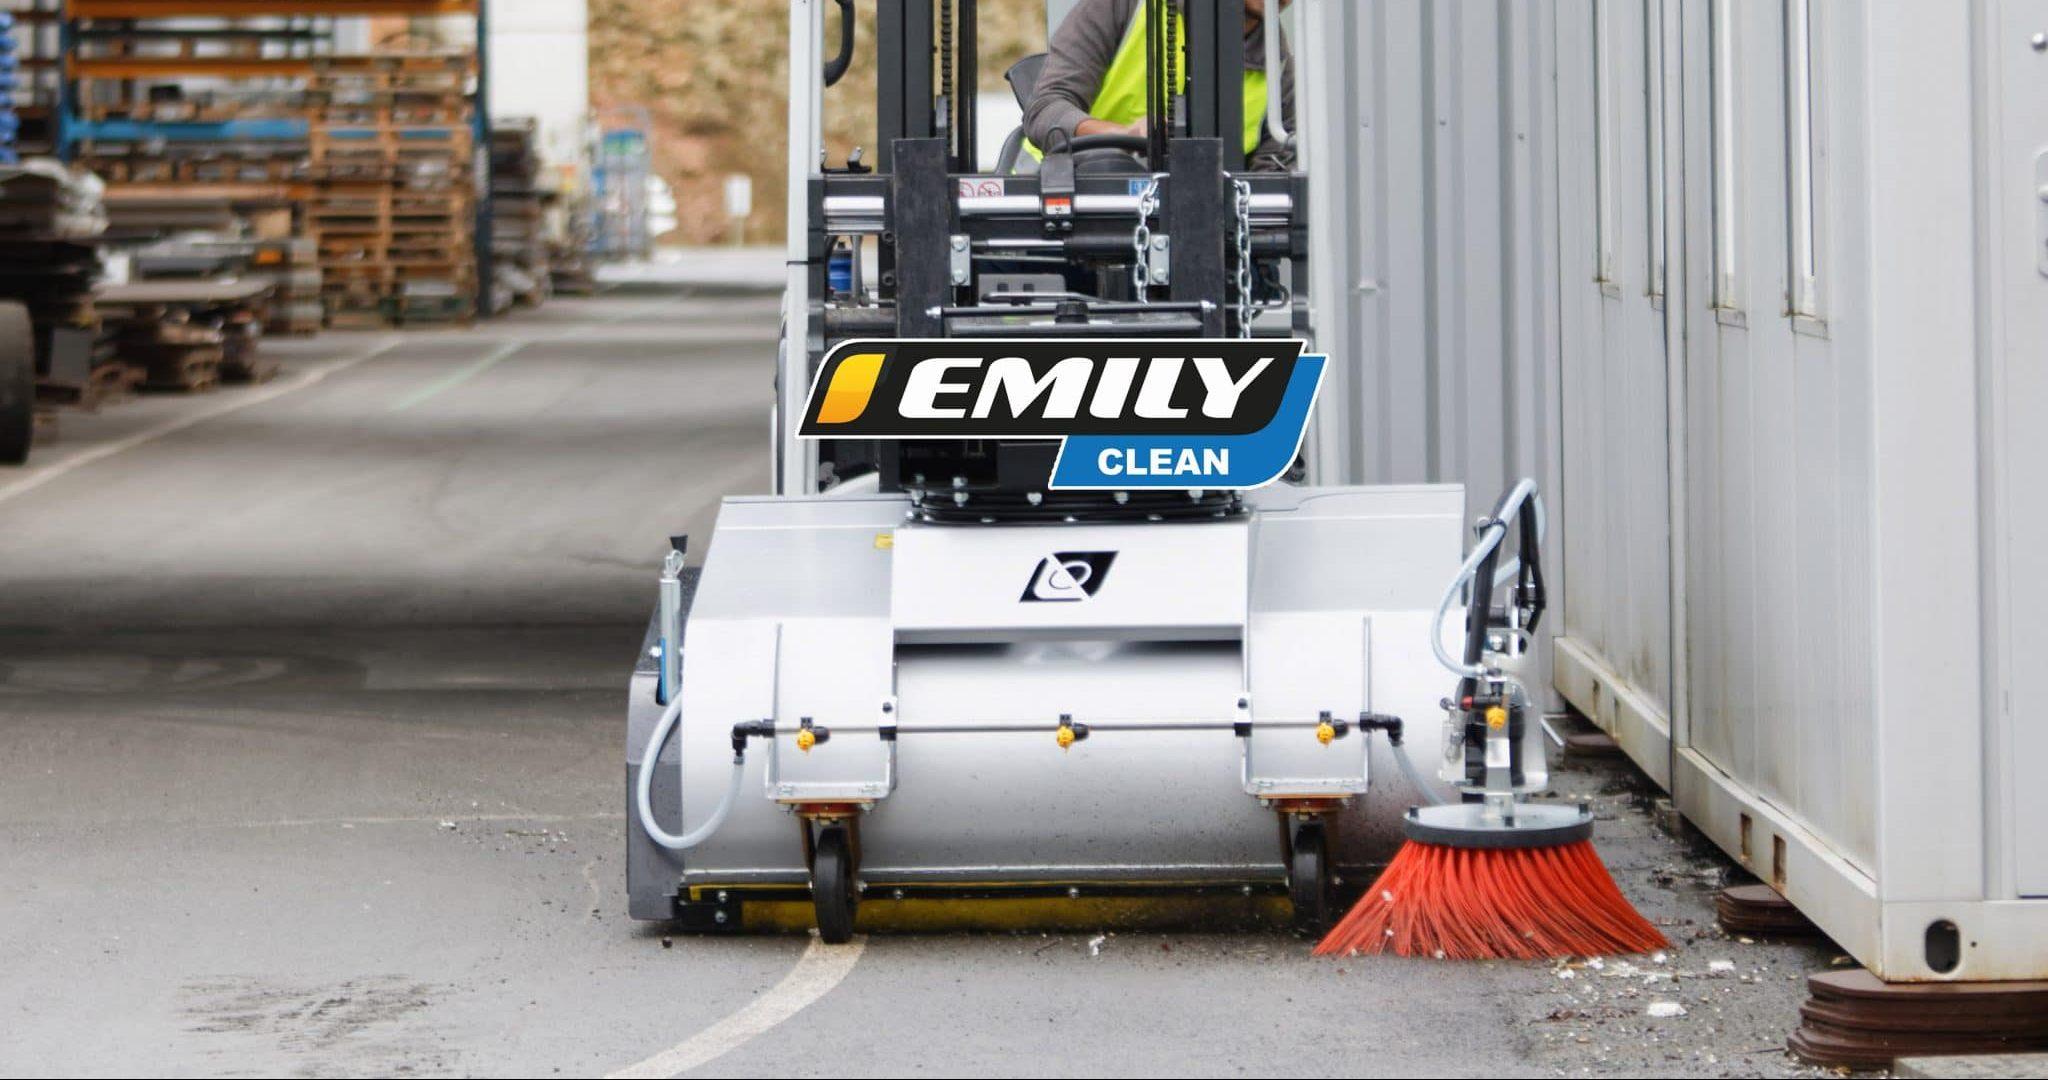 Balayeuse industrielle ramasseuse Emily Clean